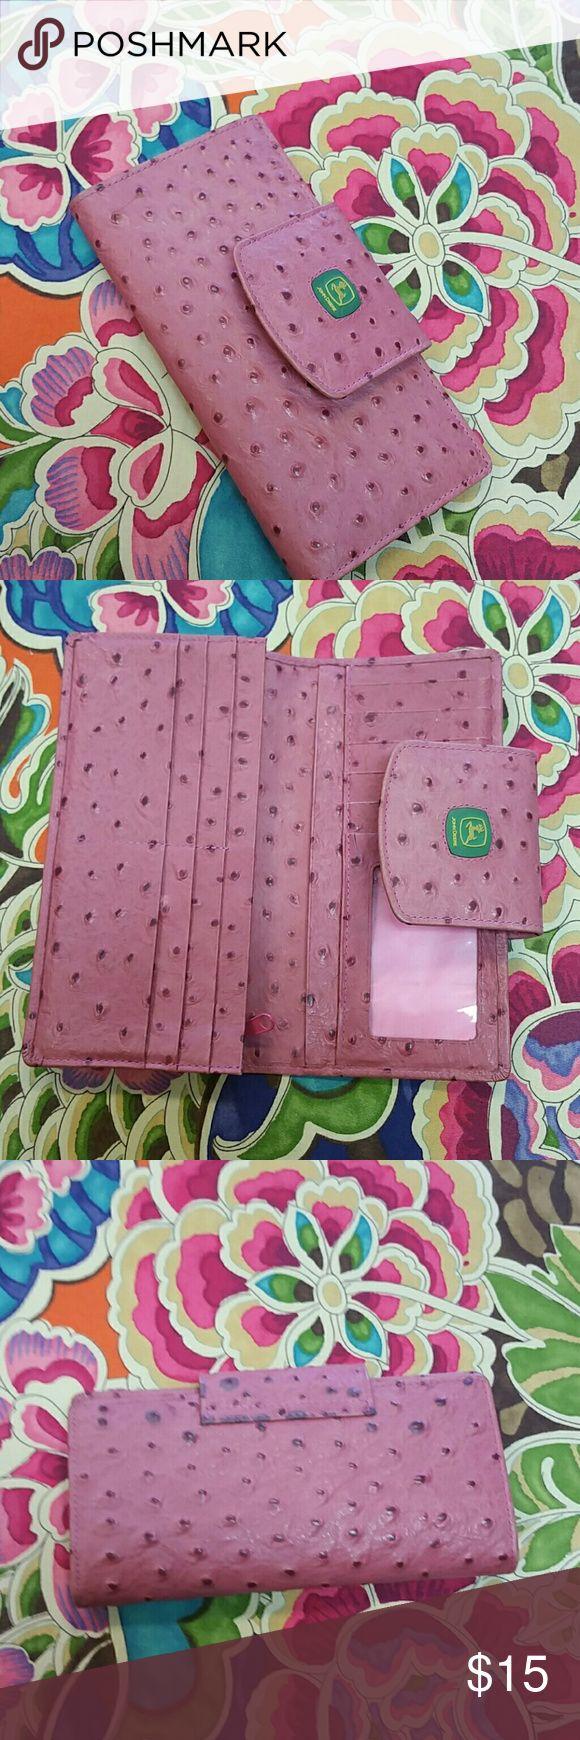 John Deere Reptilian Style Wallet Beautiful Pink Wallet  Credit Card Slots  Checkbook Style John Deere Bags Wallets